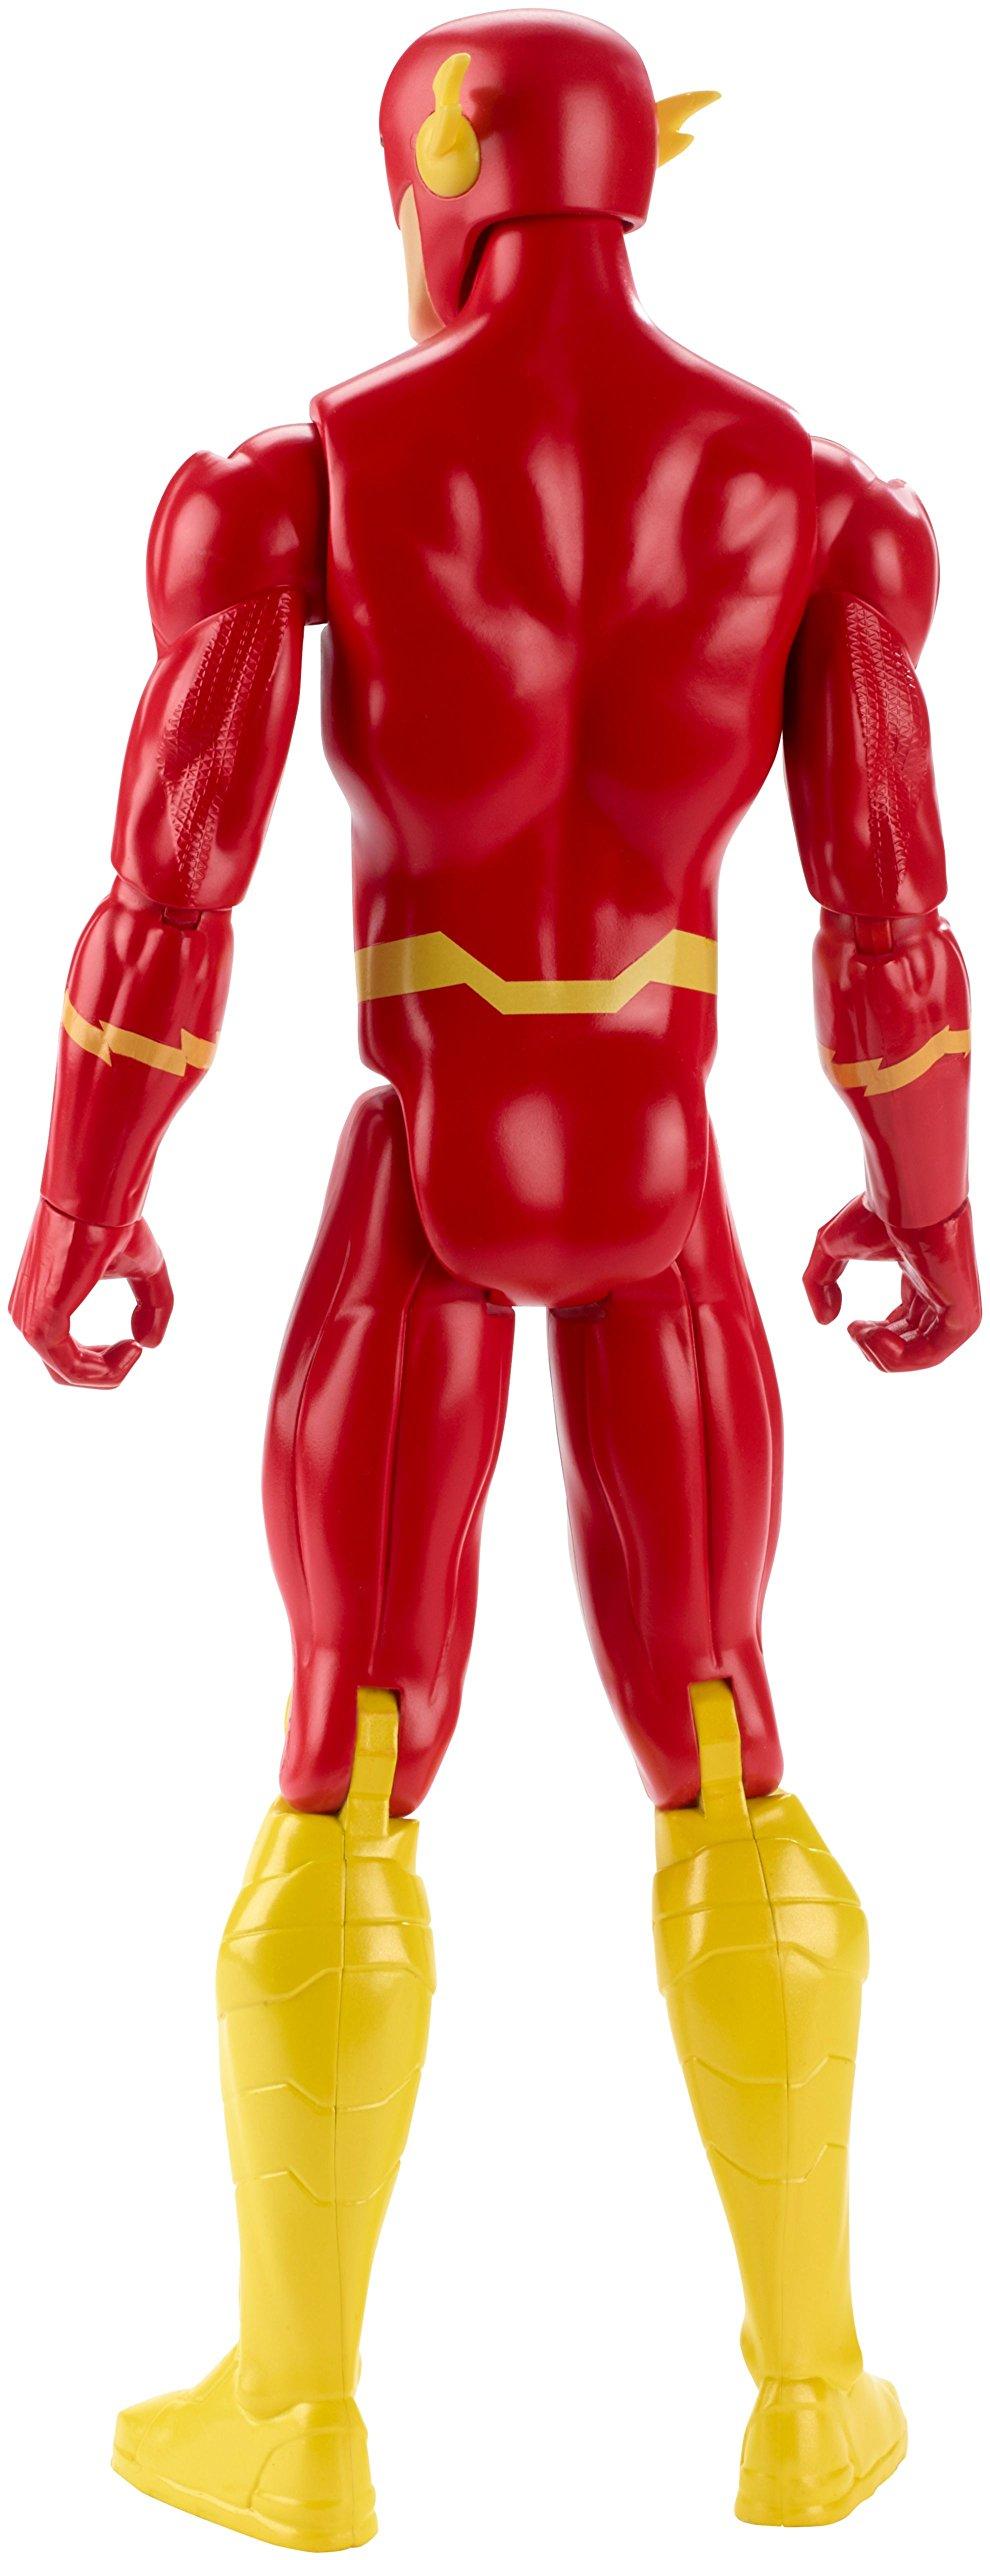 Justice League Action The Flash Figure, 12'' by Mattel (Image #3)